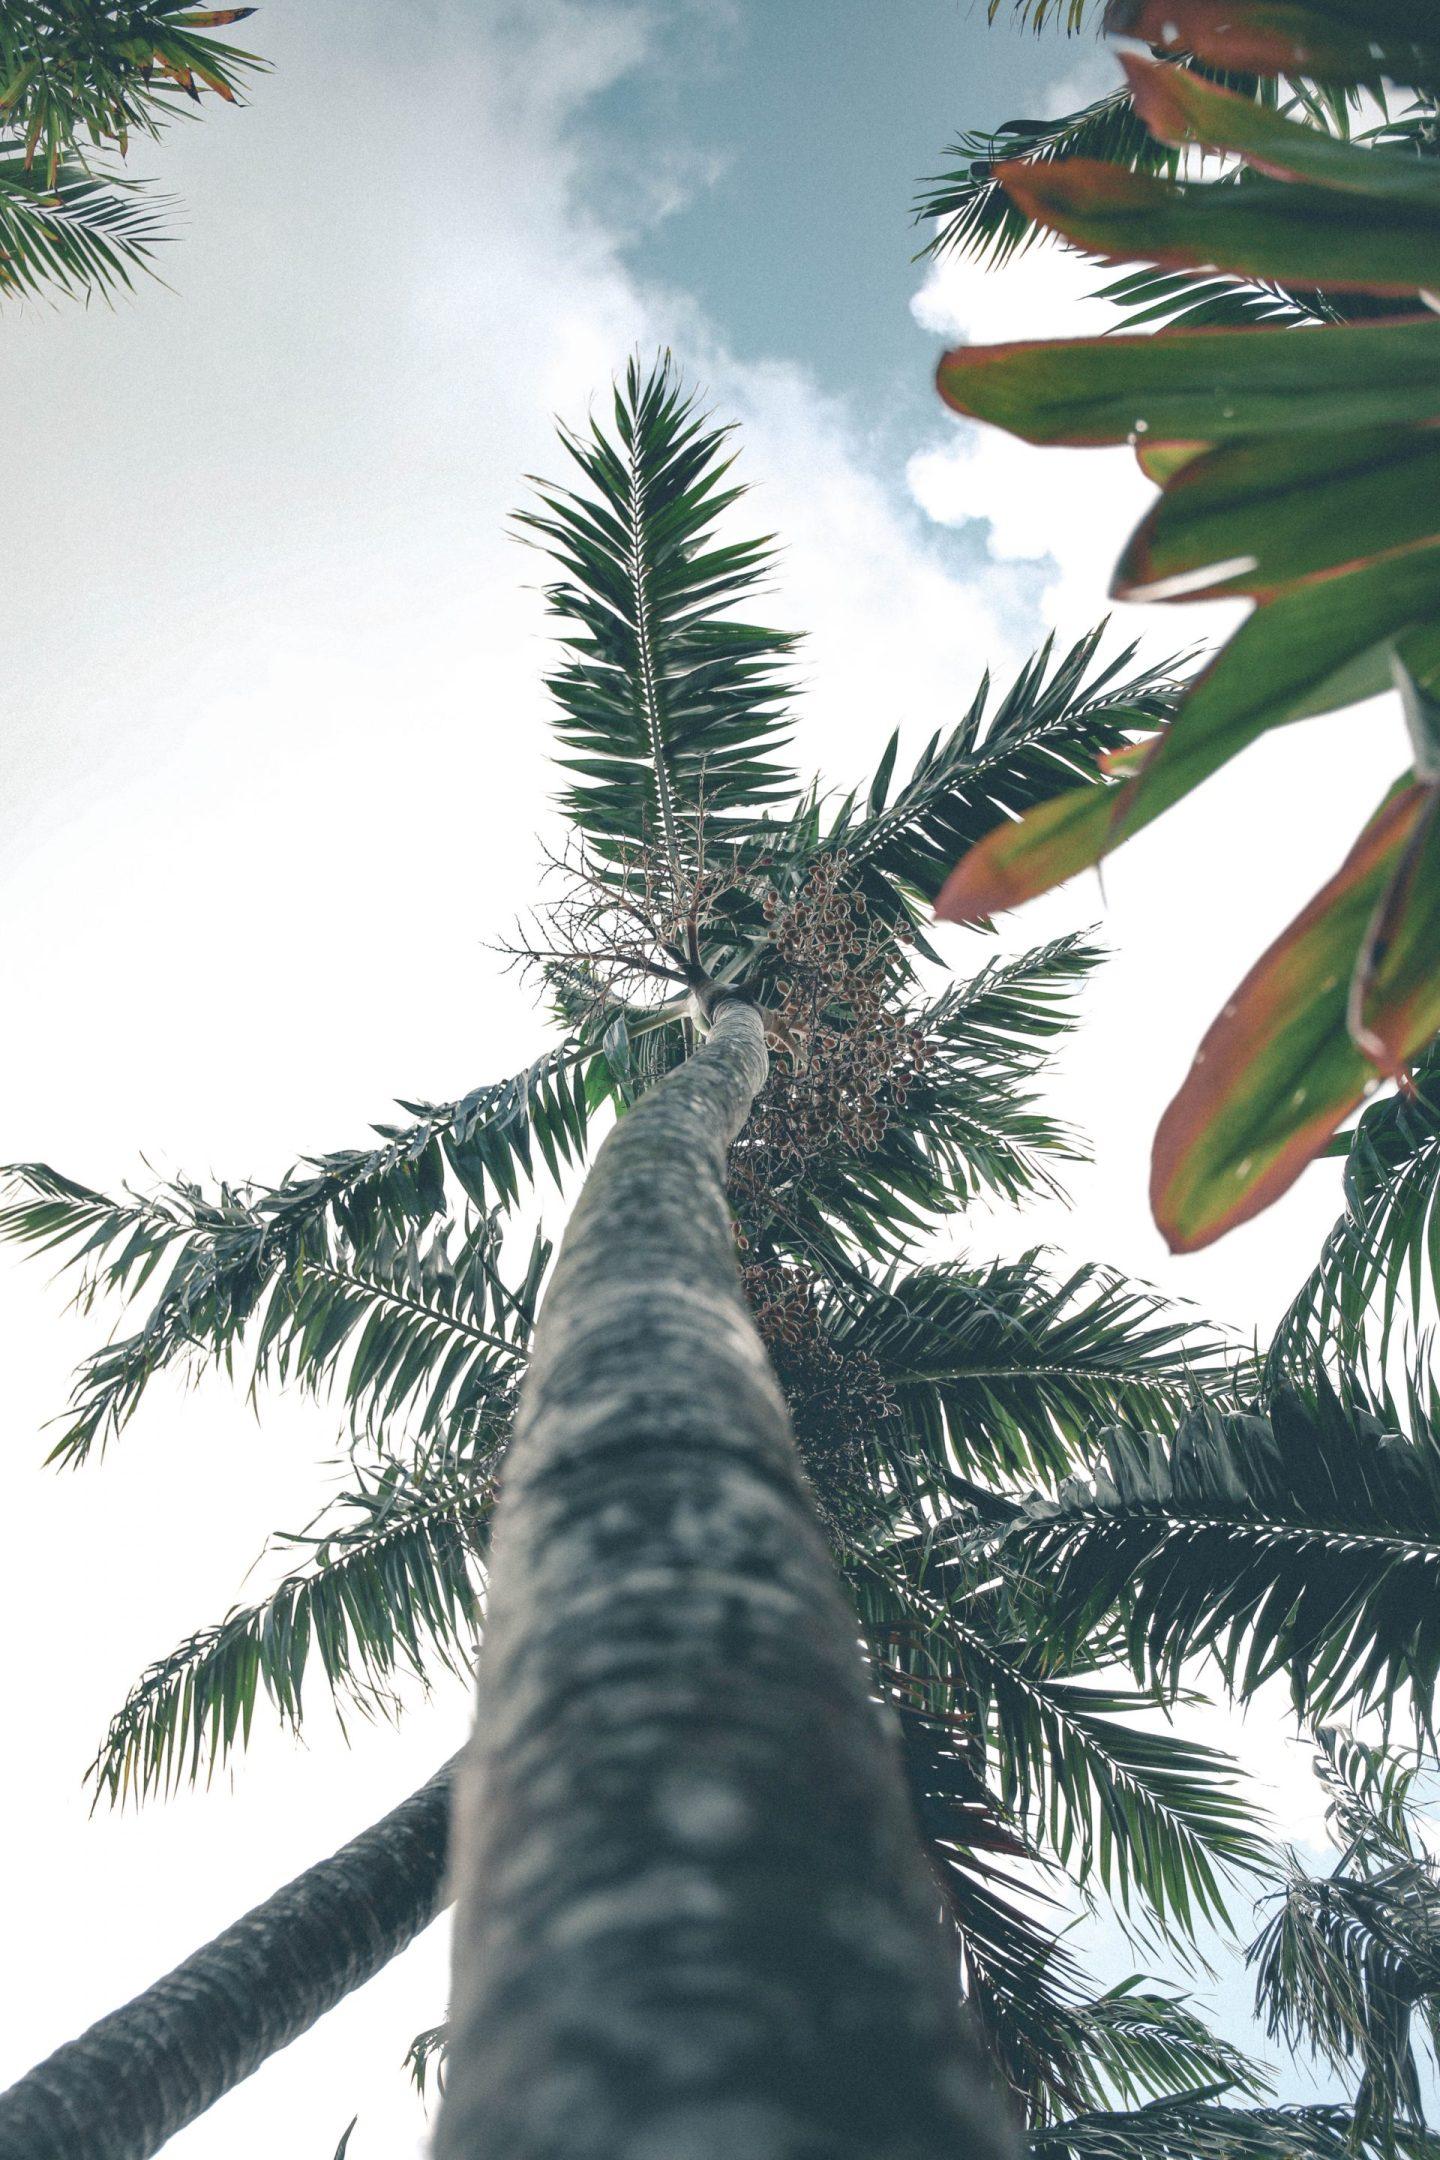 Cayman Islands Botanical Gardens